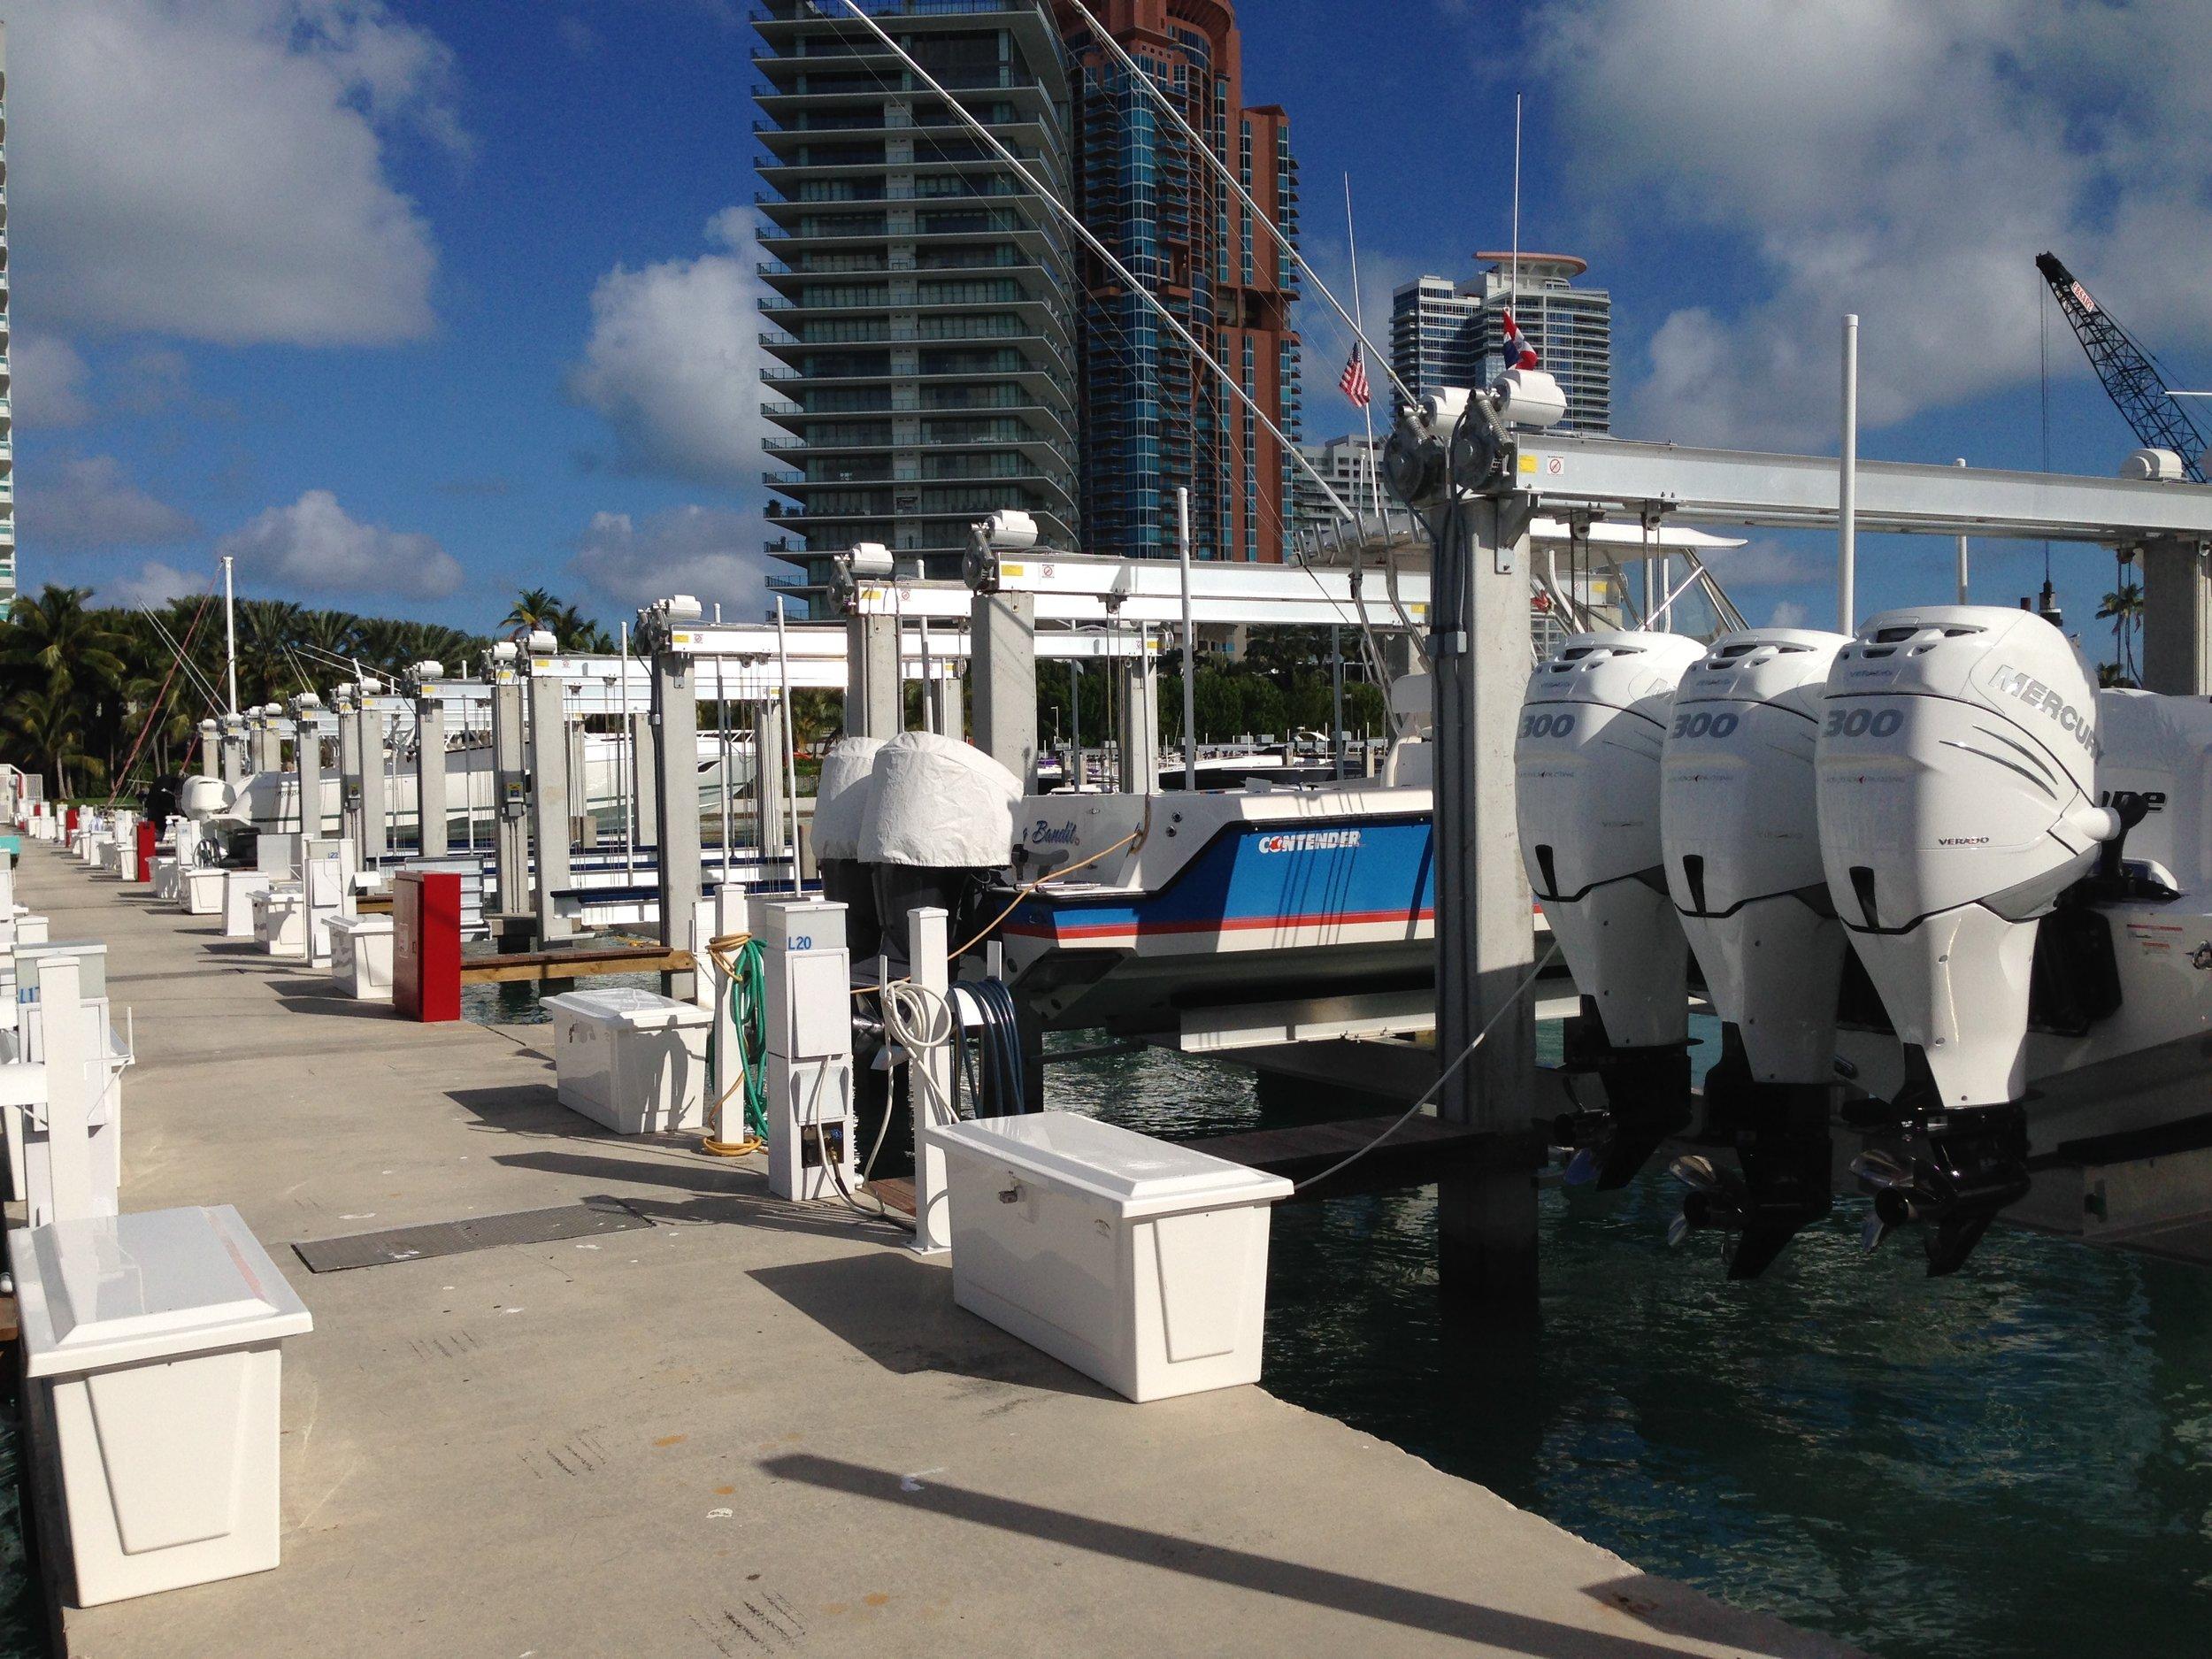 boat lift, boathouse lift, bootlift, boot lift, boatlifting systems, 4-post, bootslift, schiffshebewerk, bådehus lift, båd elevatorer, båd lift, elevador marítimo, boatlift, elevador de barcos